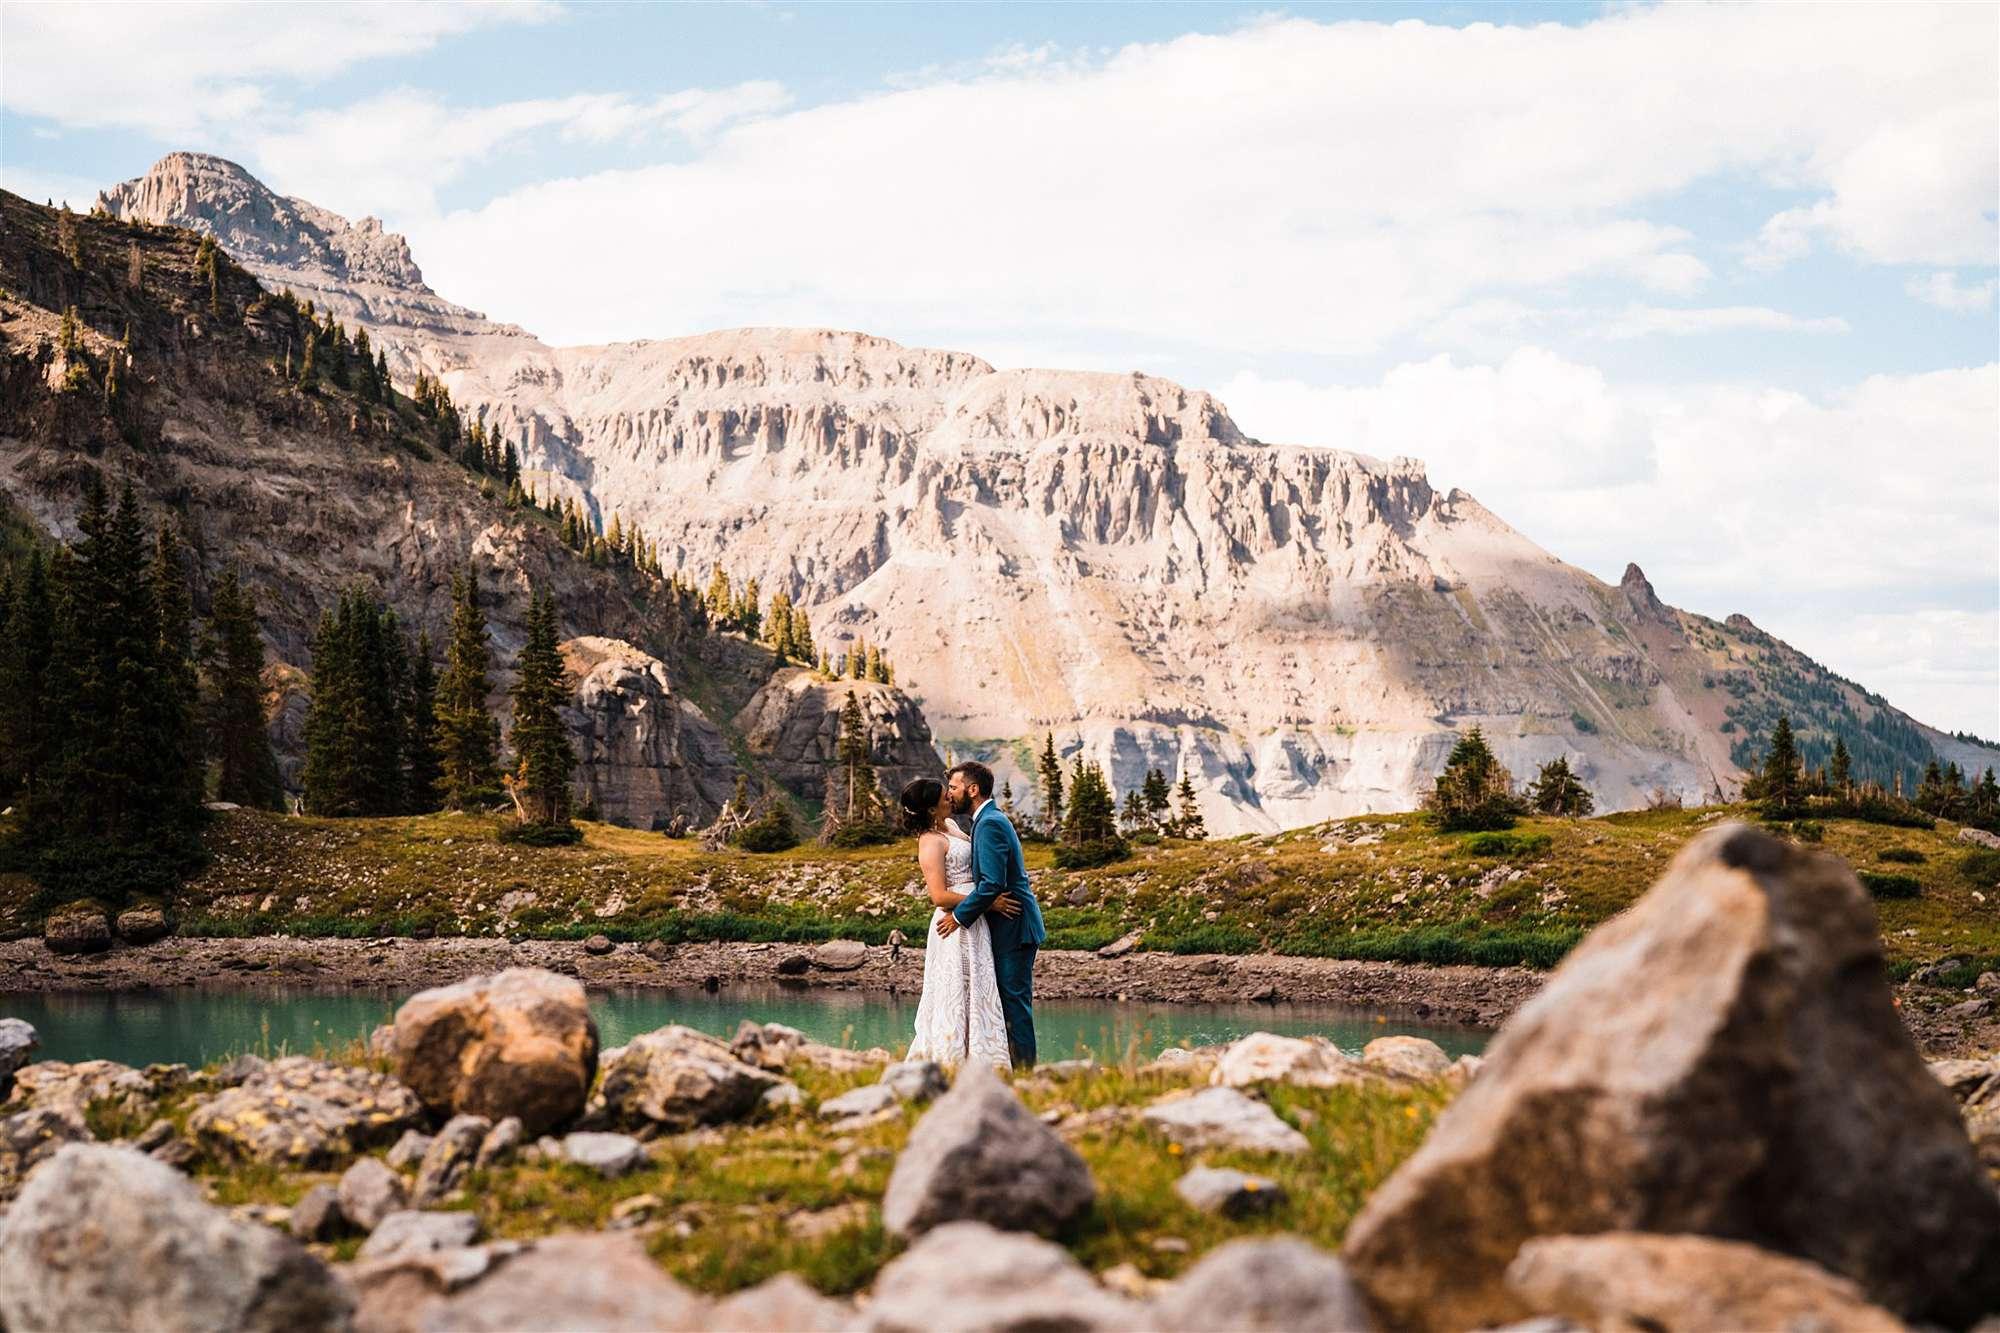 Colorado_Jeeping_Elopement_Emily_Matt_The_Foxes_Photography_0019.jpg